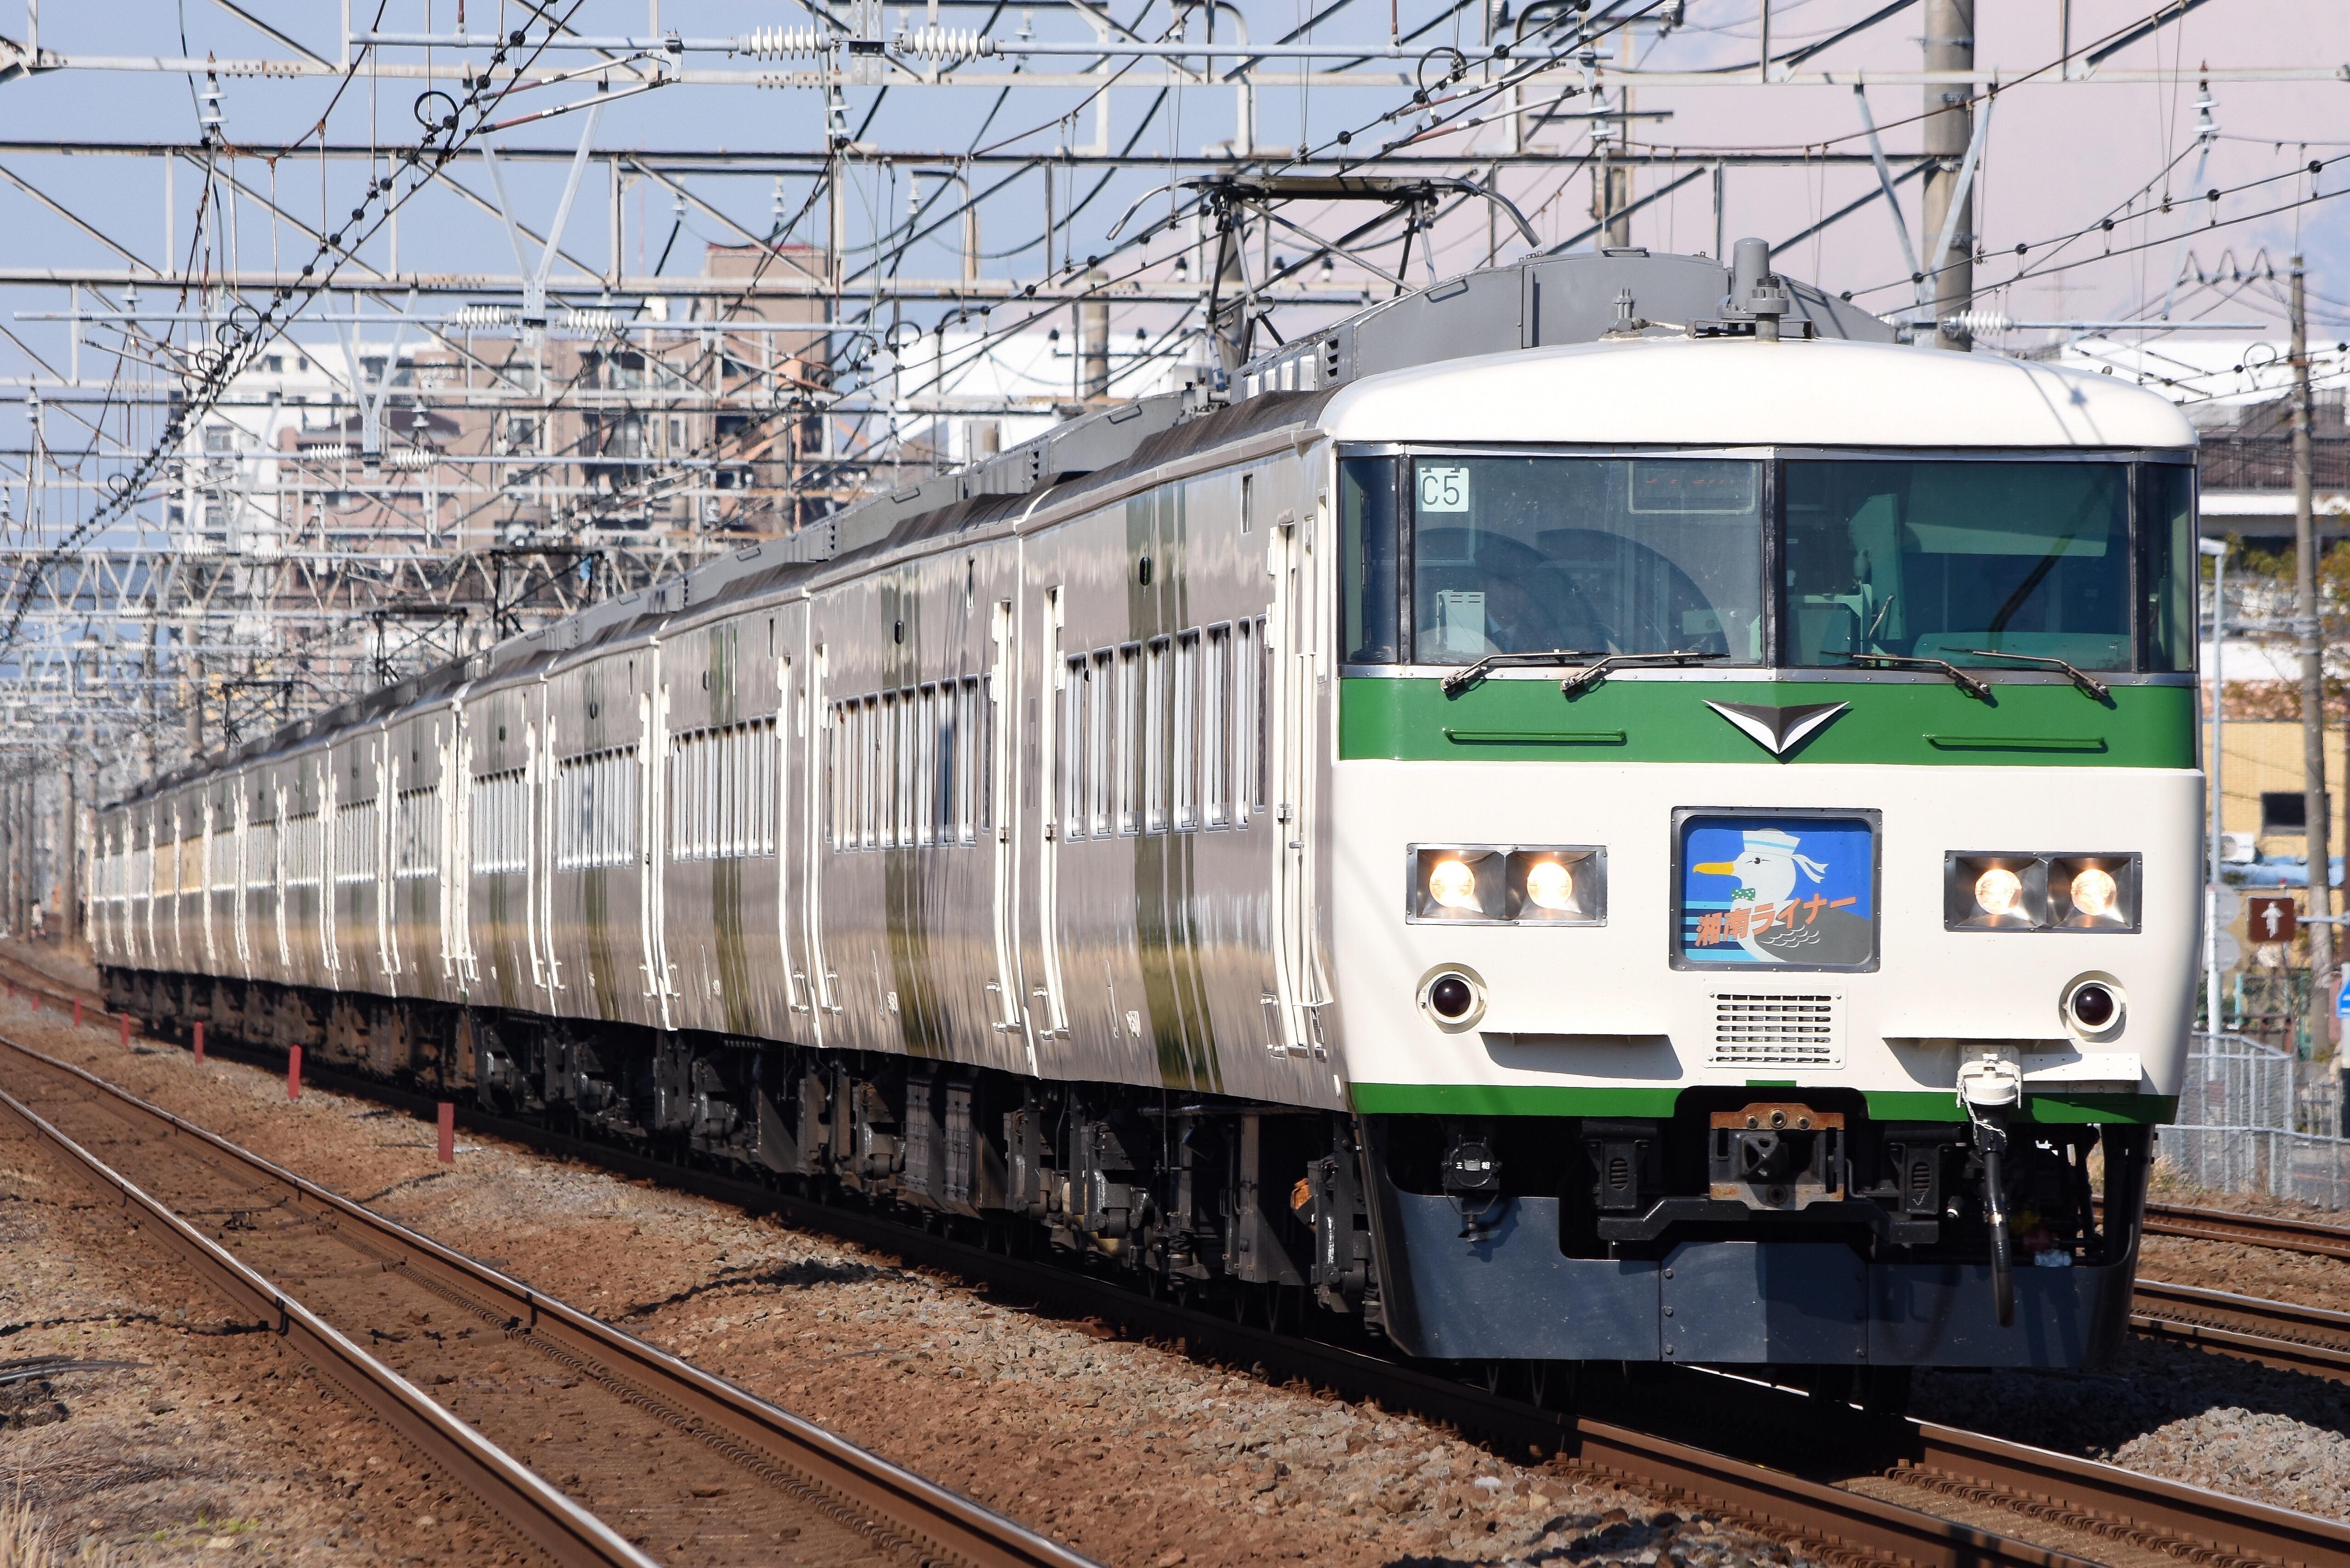 f:id:Nagaoka103:20190407163421j:image